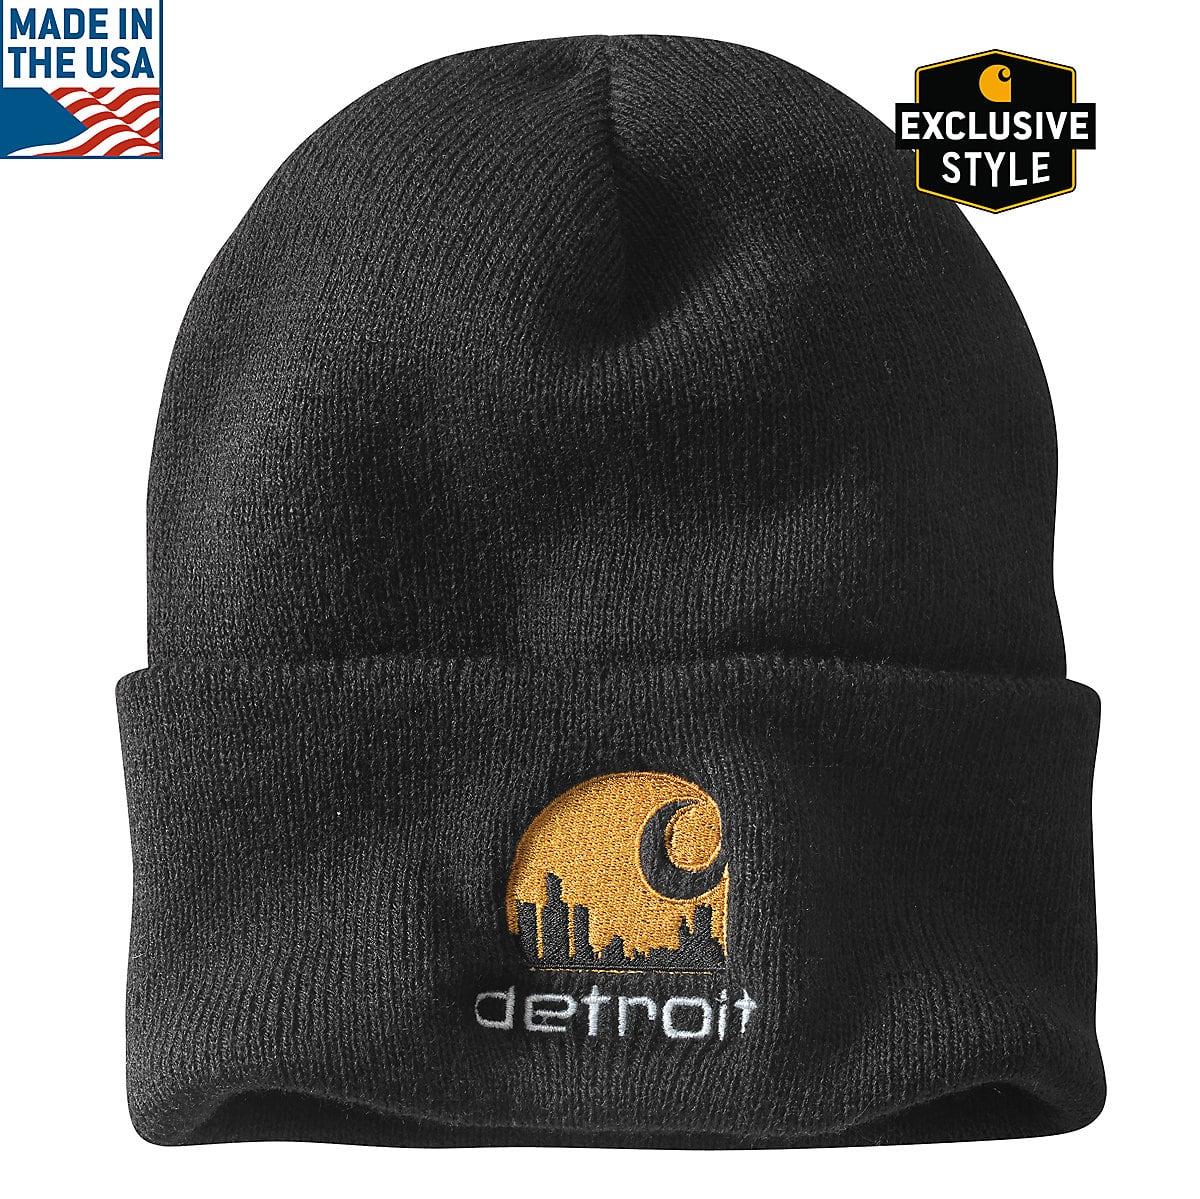 05358fae7 Men's Special Edition Detroit Acrylic Watch Hat 102376 | Carhartt